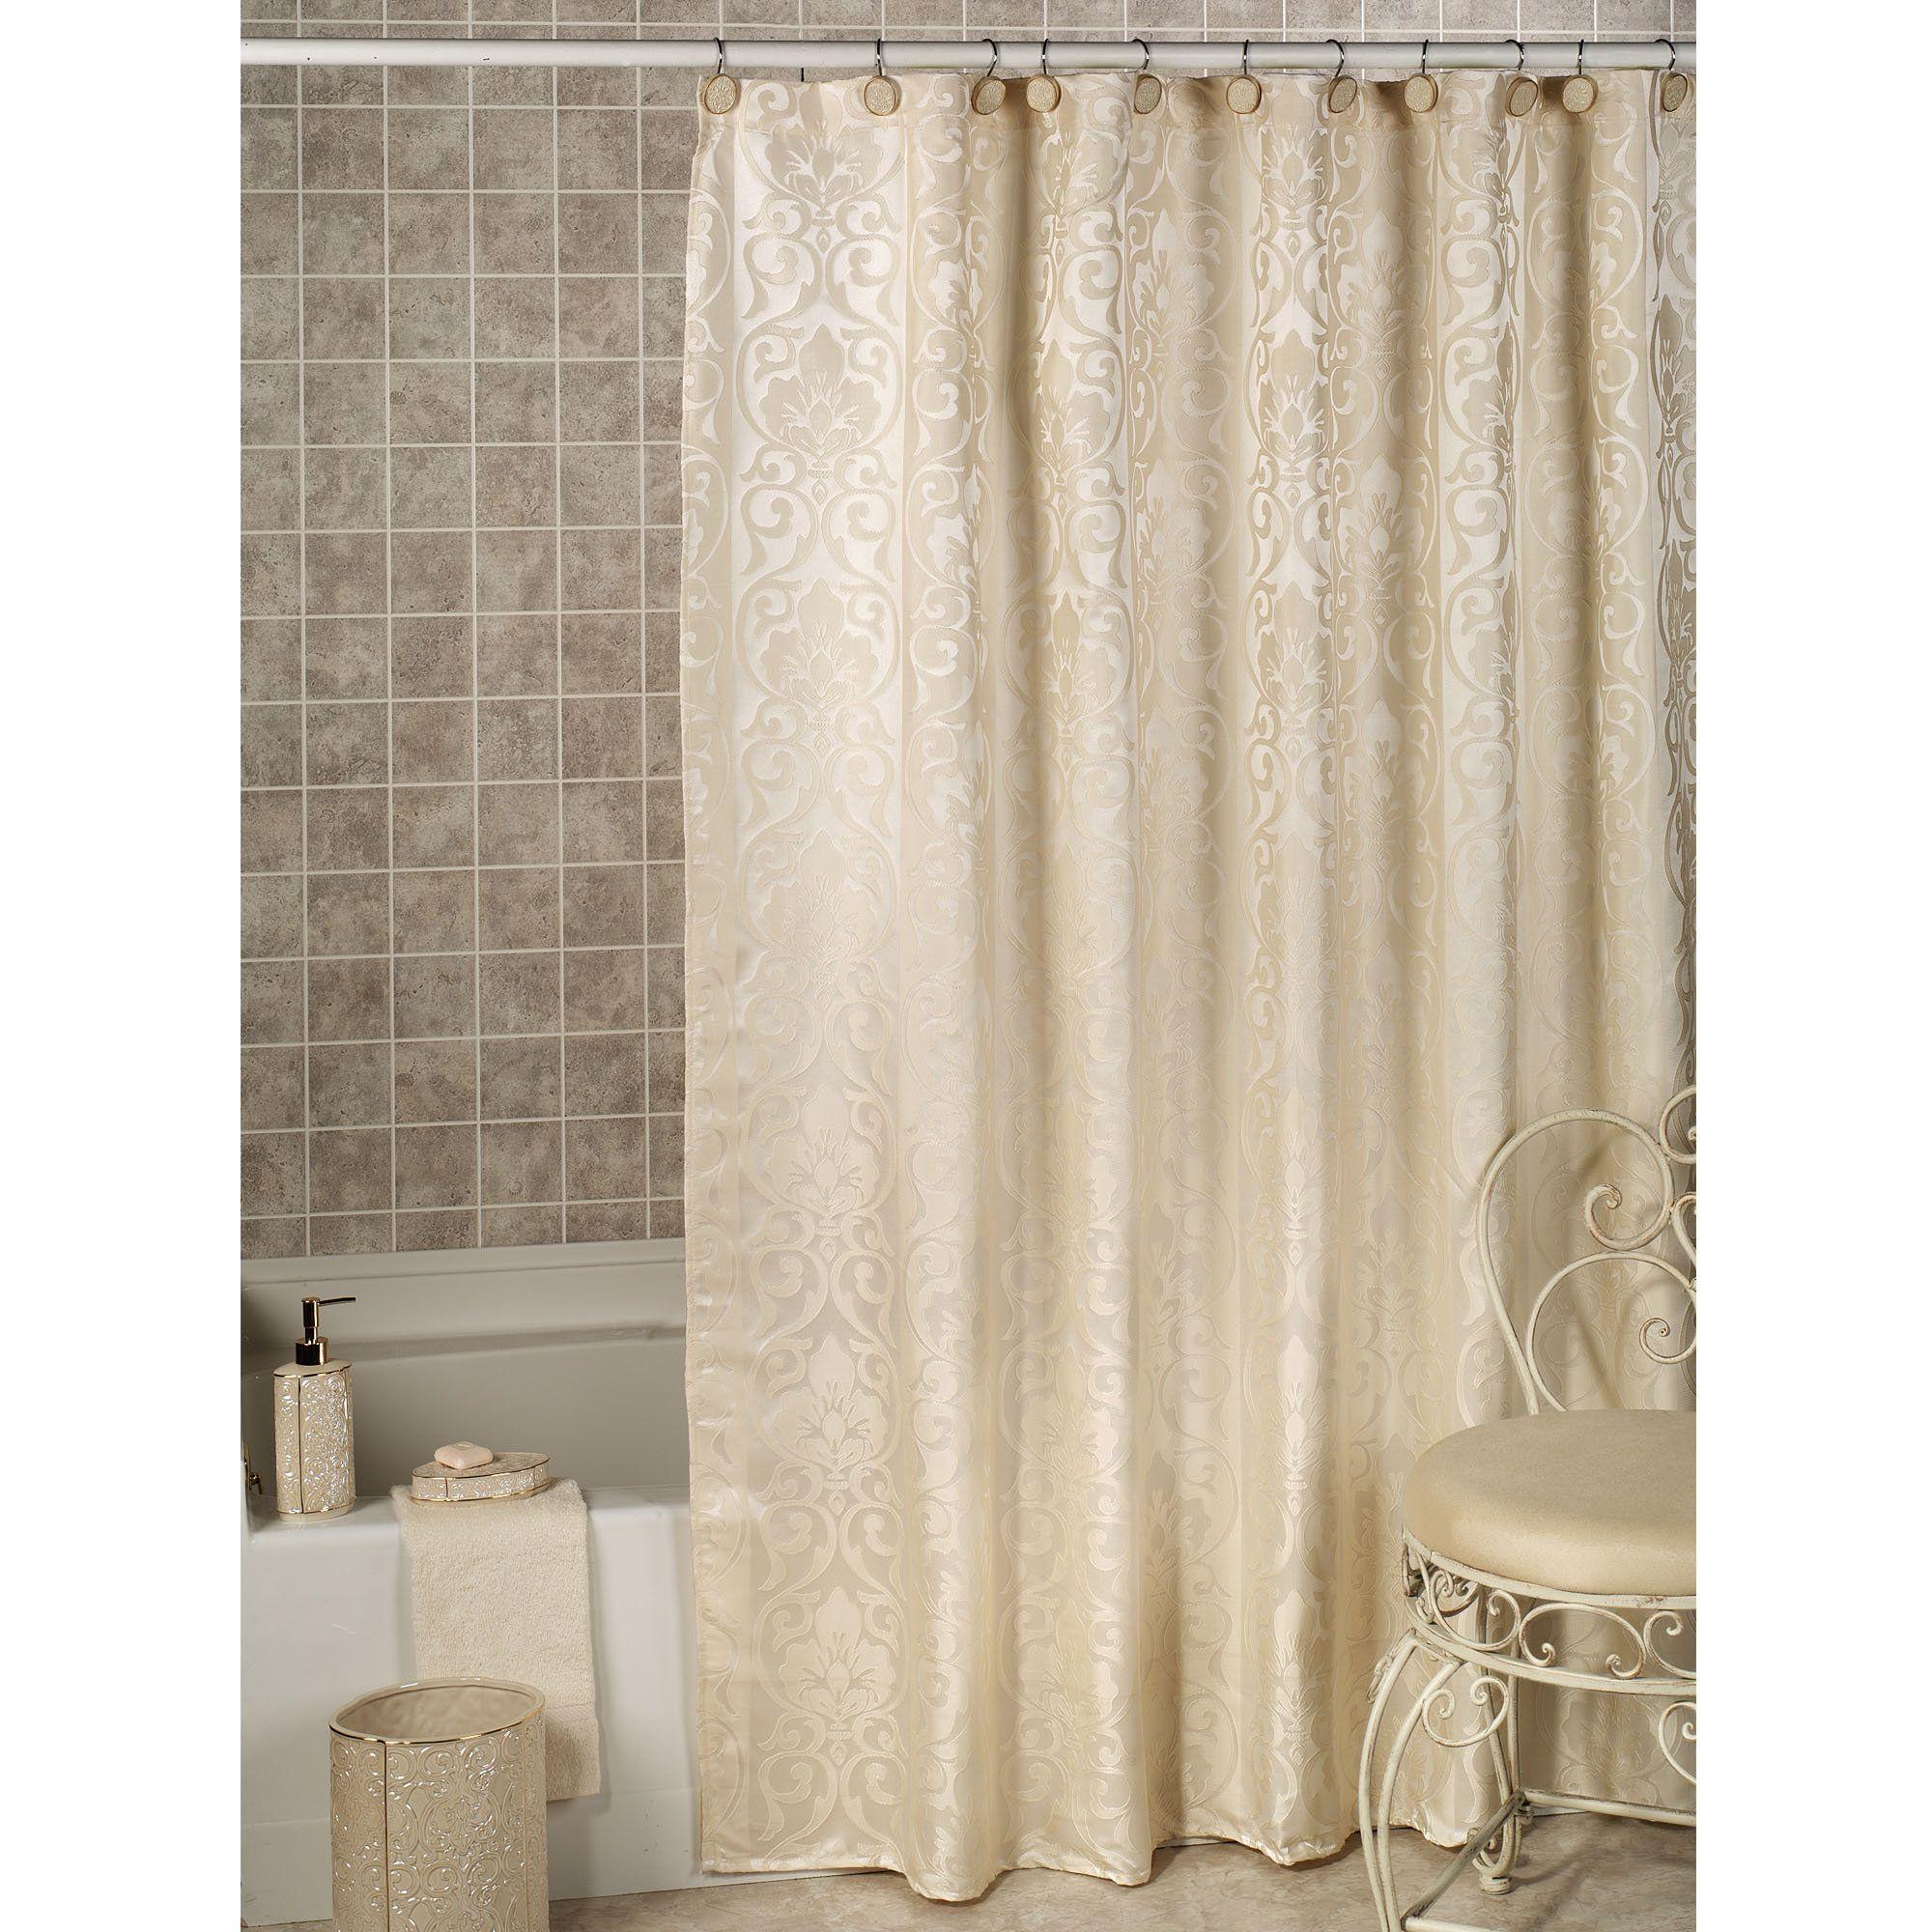 Furla Cream Damask Shower Curtain with Liner | Bathroom ...